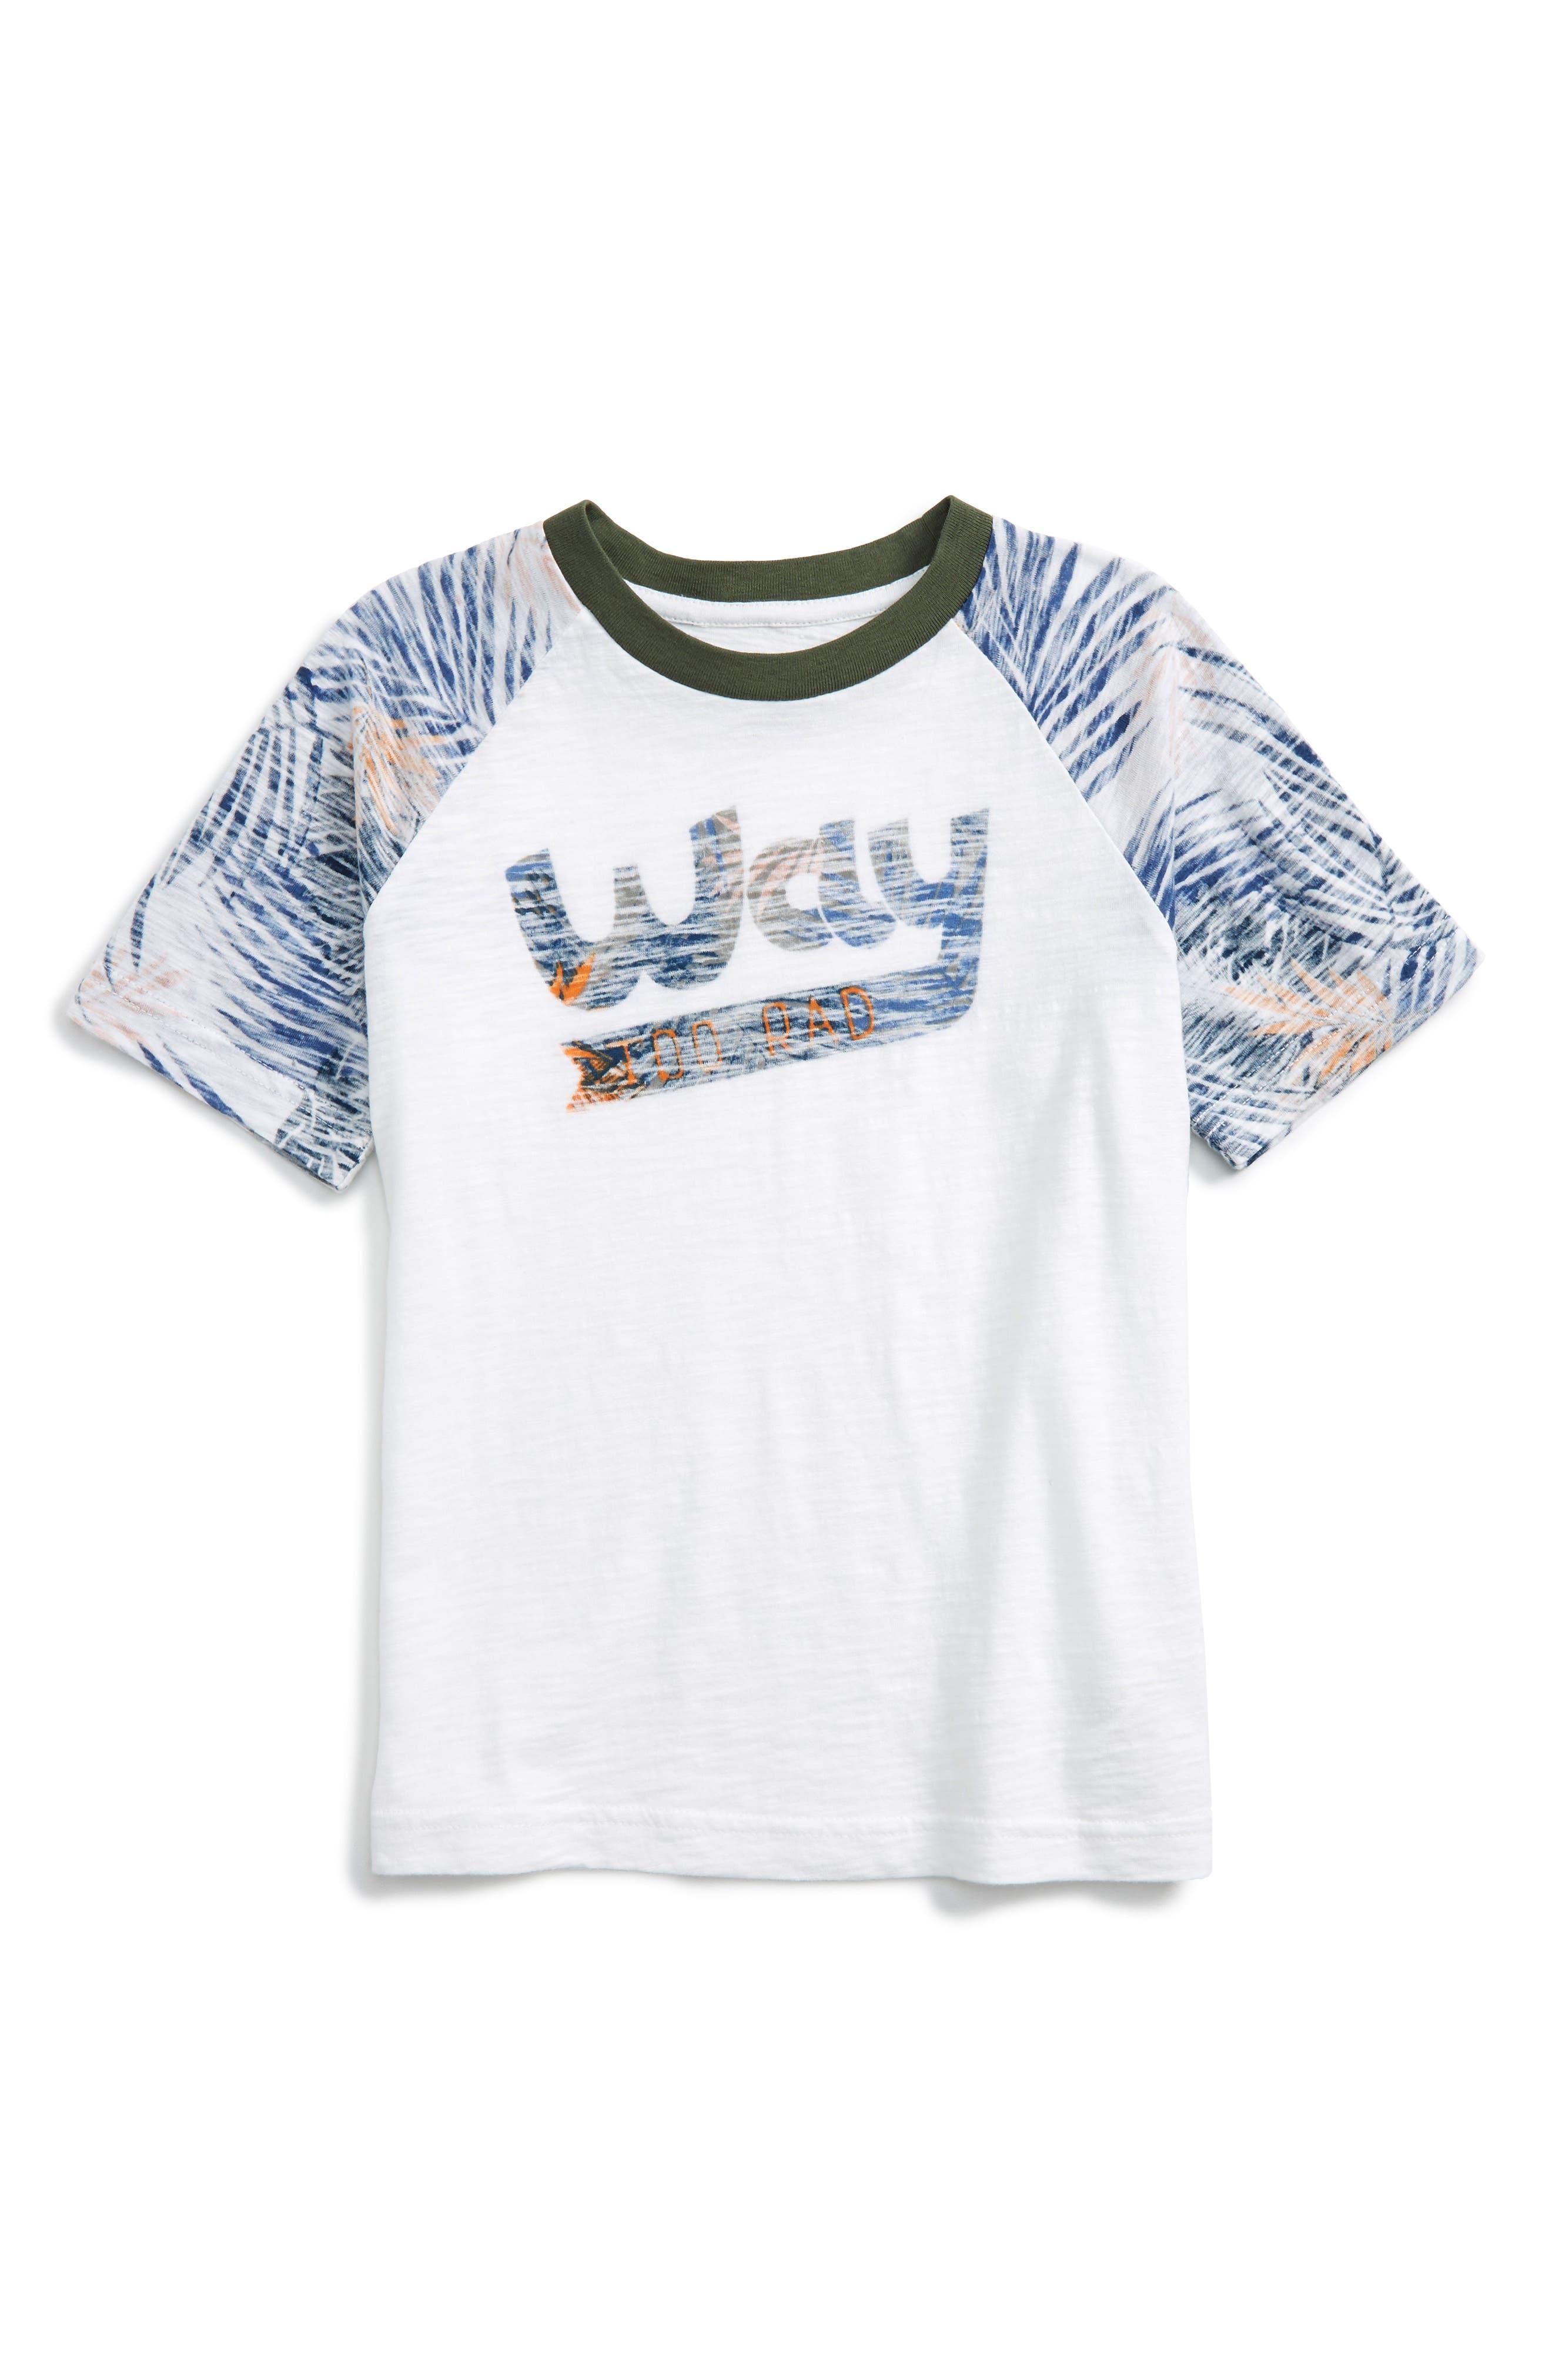 Tucker + Tate Palm Reverse Print T-Shirt (Toddler Boys & Little Boys)